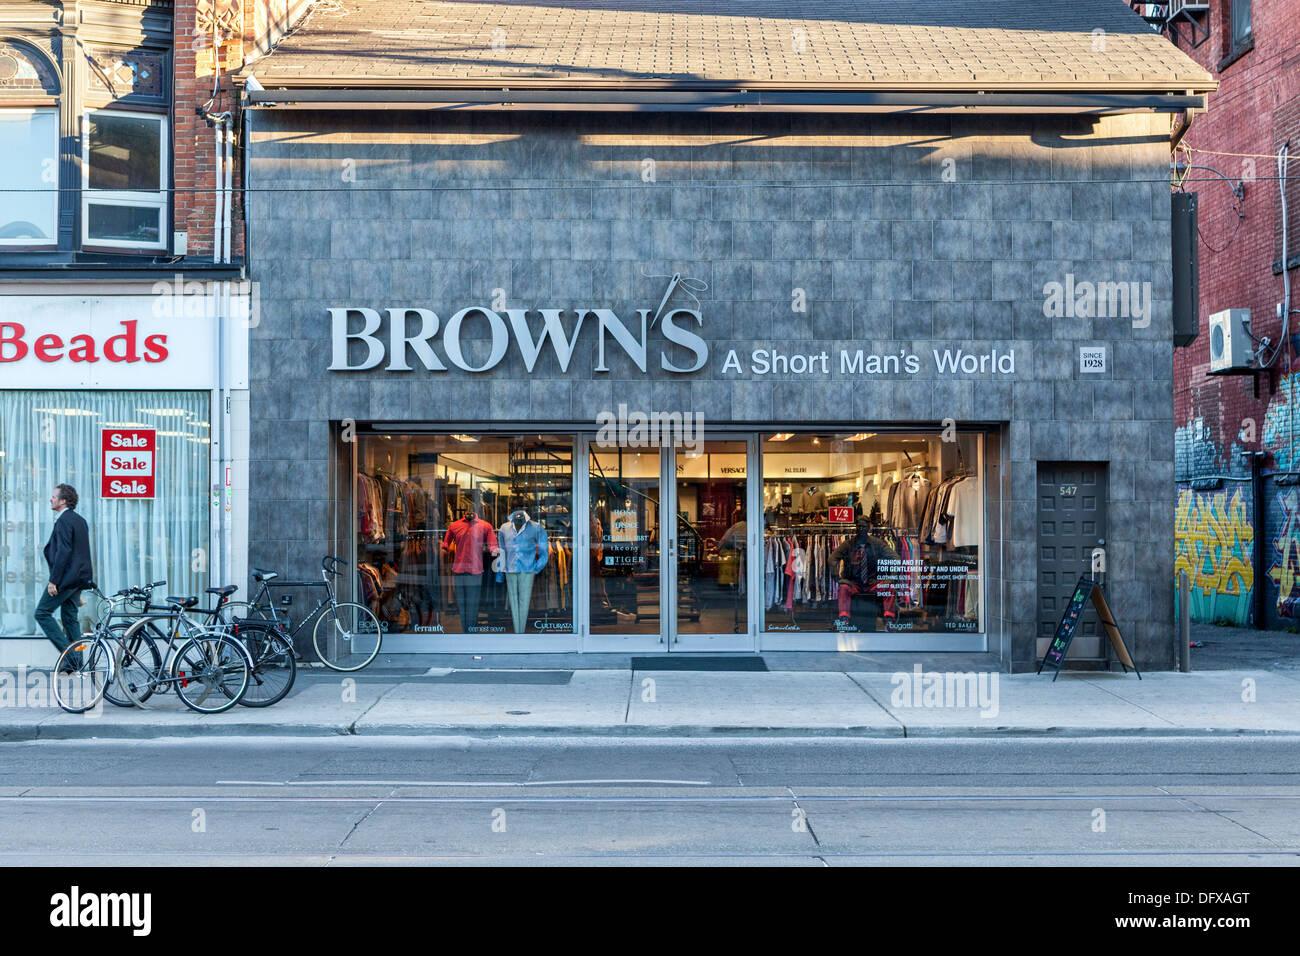 ec7e62e697 Shops in Queen Street West - Brown's, a short man's world and bead shop -  Toronto